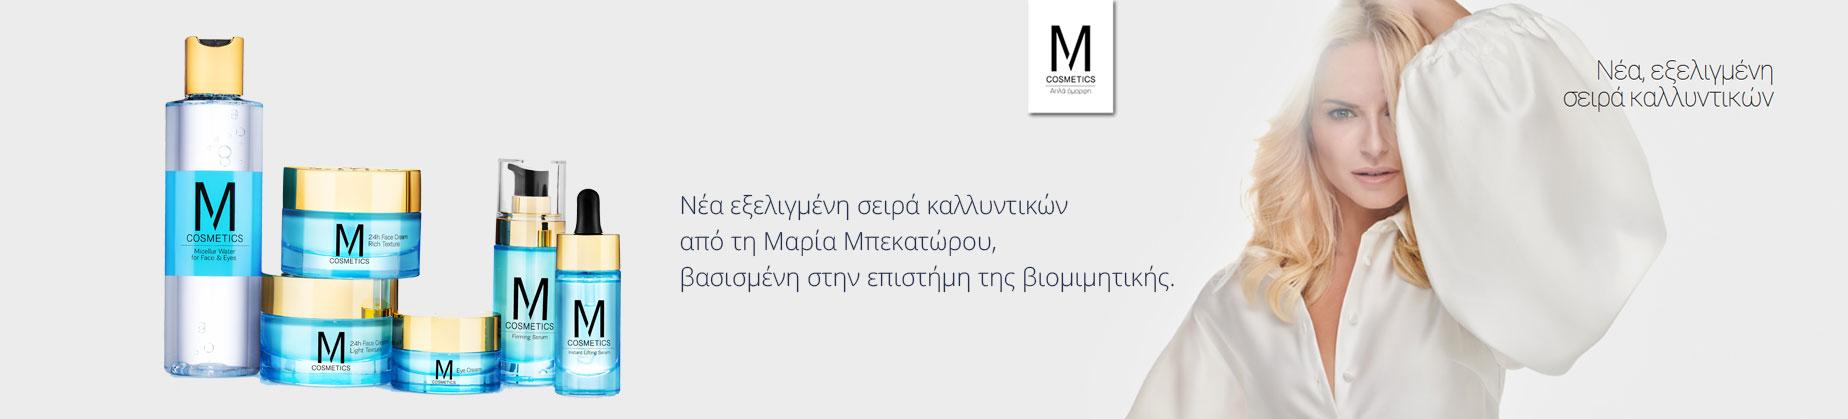 M Cosmatics | Νέα εξελιγμένη σειρά καλλυντικών από τη Μαρία Μπεκατώρου, βασισμένη στην επιστήμη της βιομιμητικής.